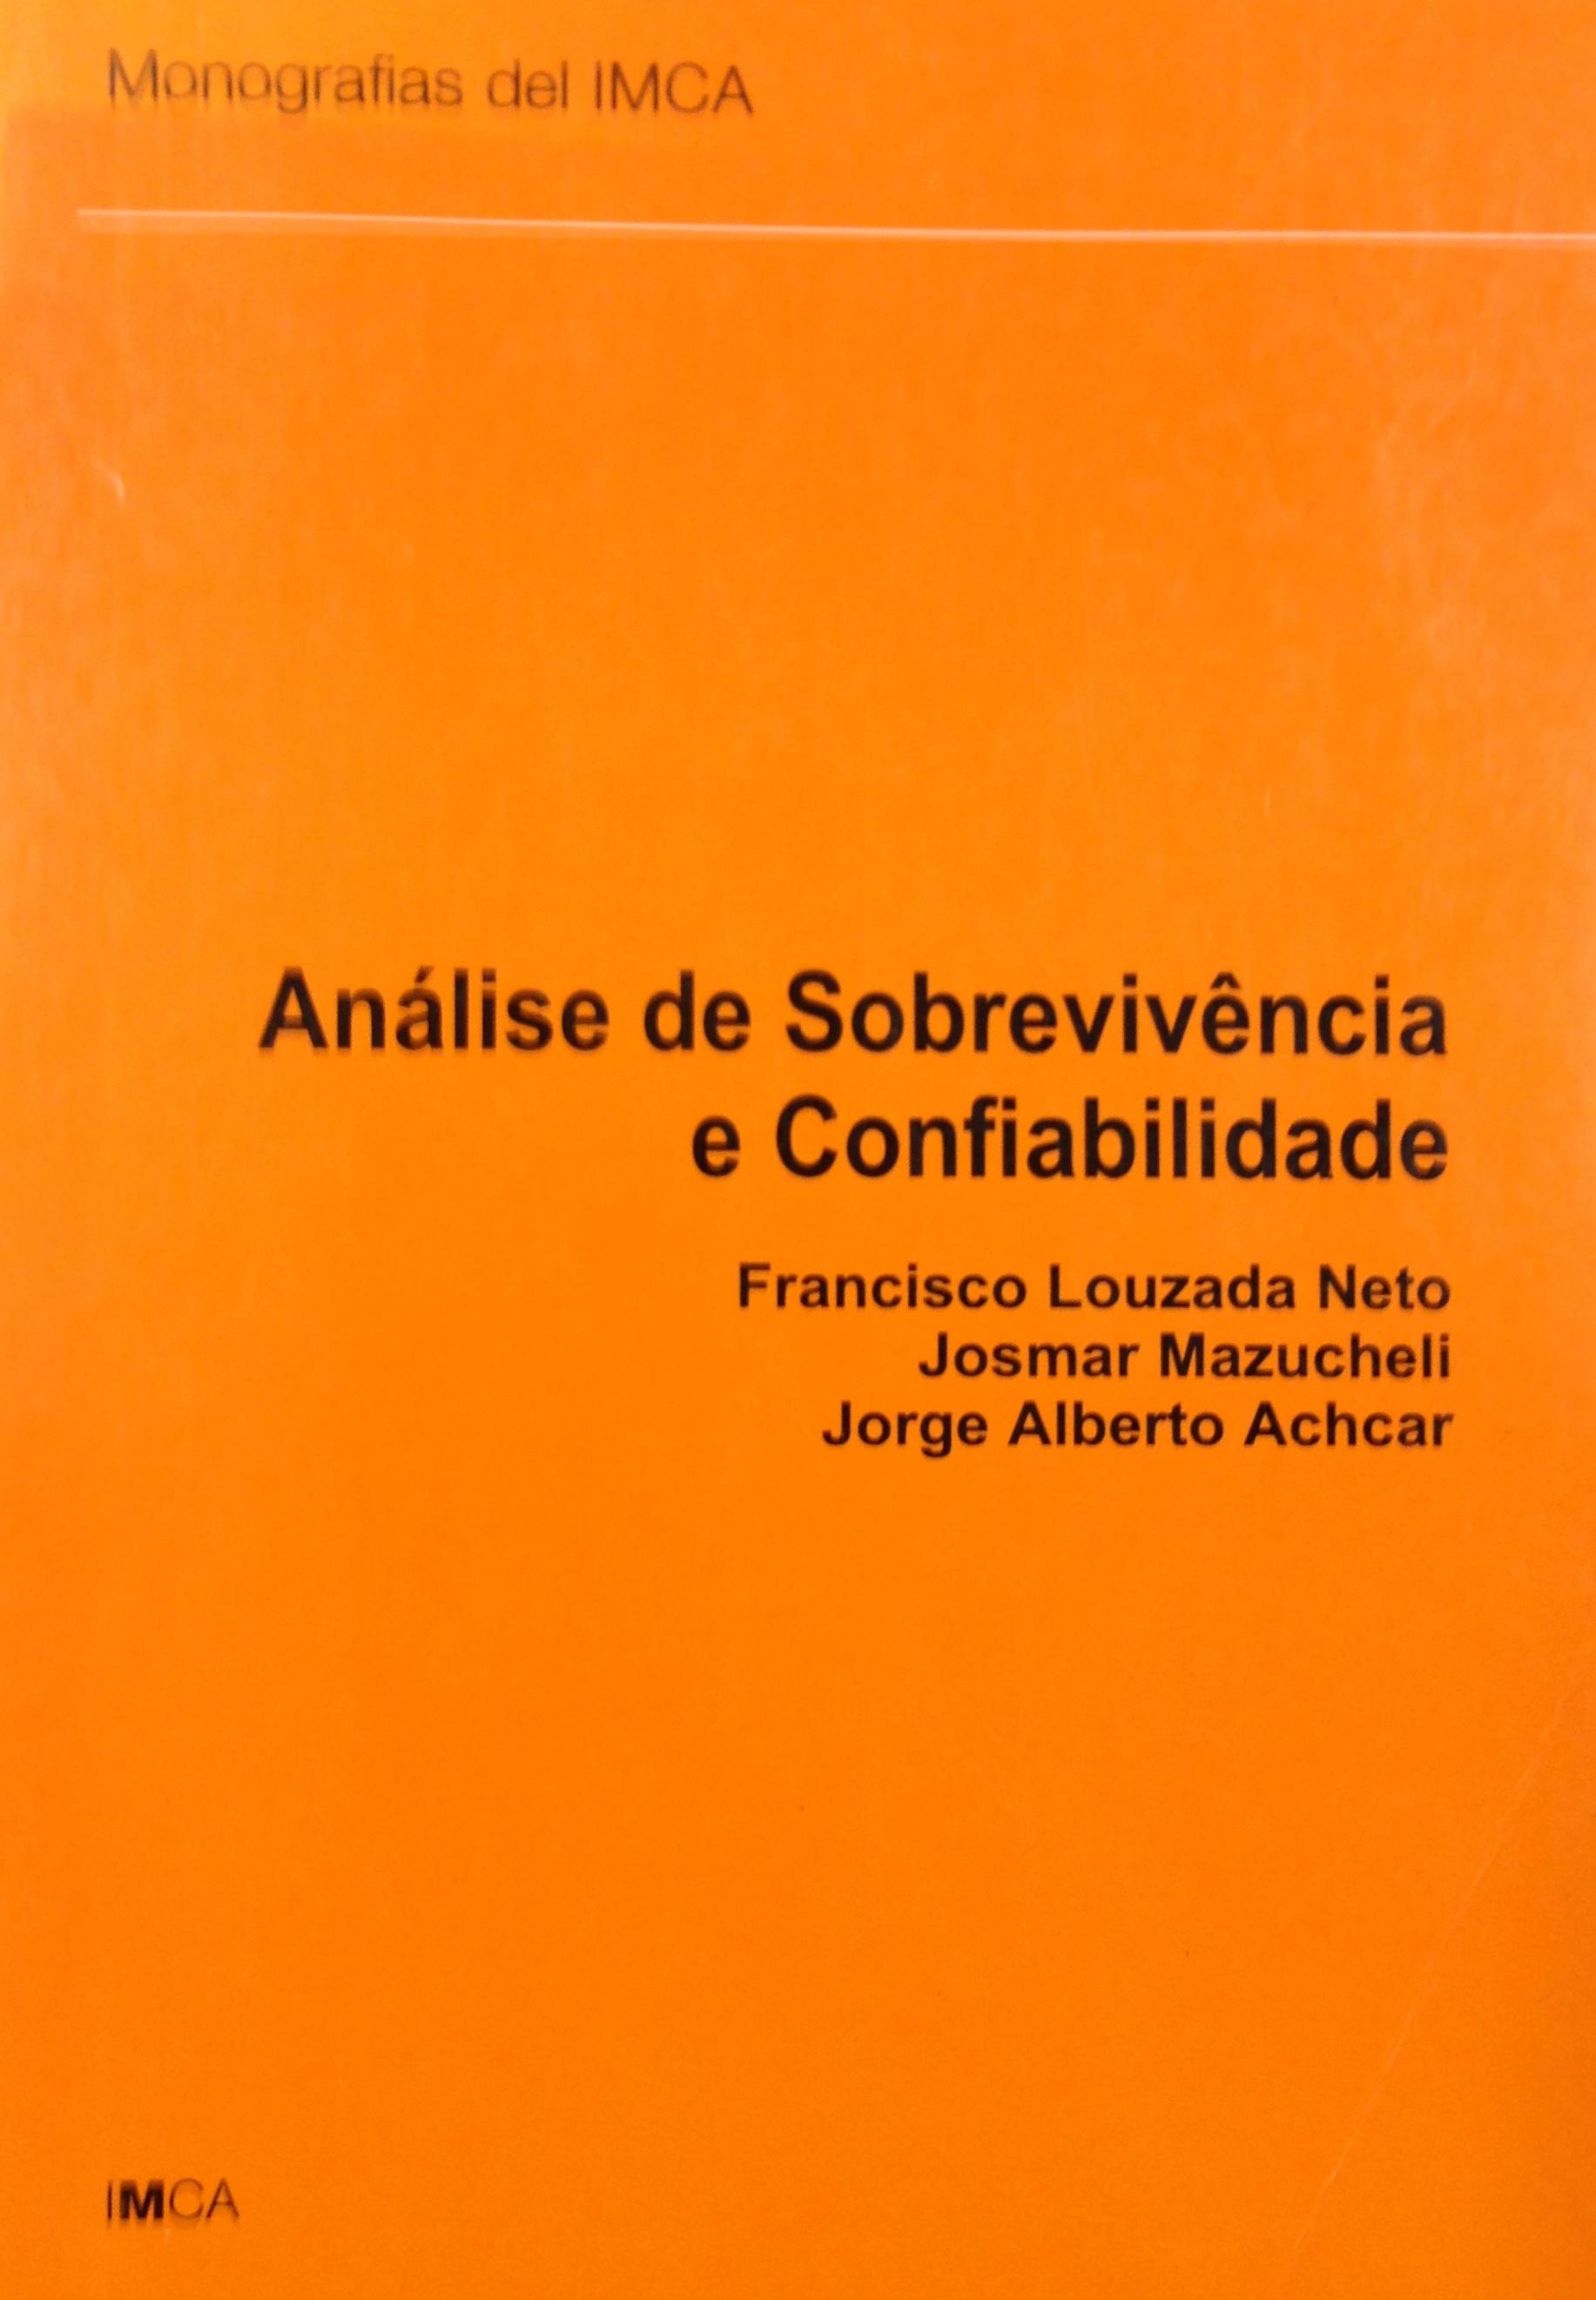 Analise de Sobrevivencia e Confiabilidade Francisco, Josmar e Jorge